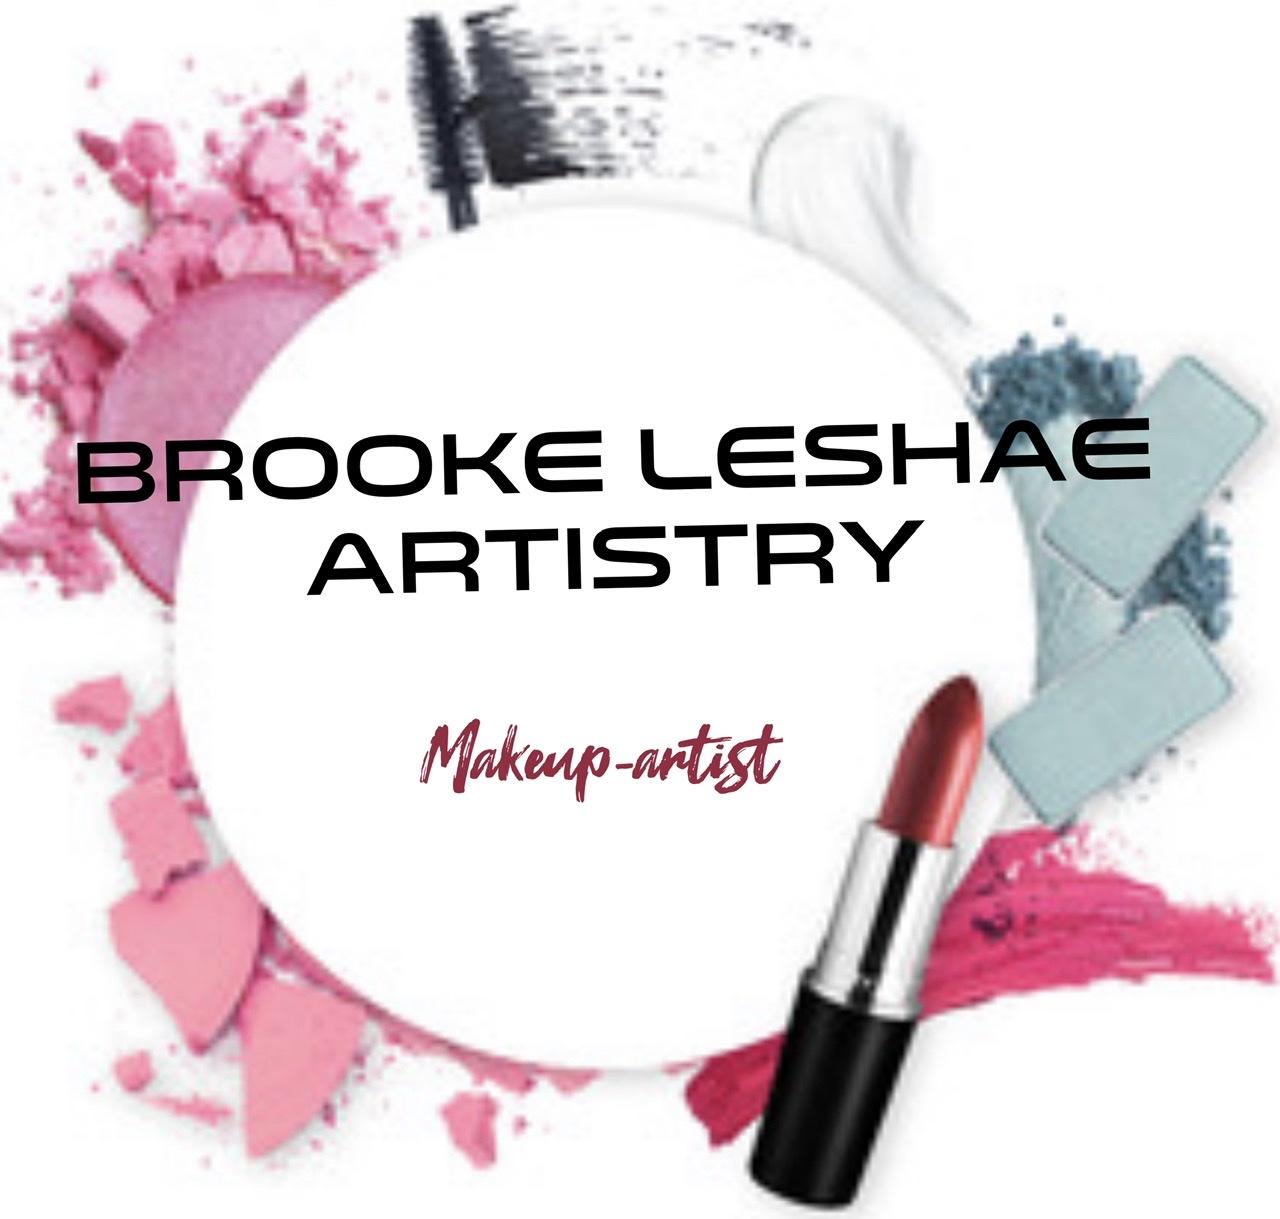 Brooke LeShae Artistry primary image